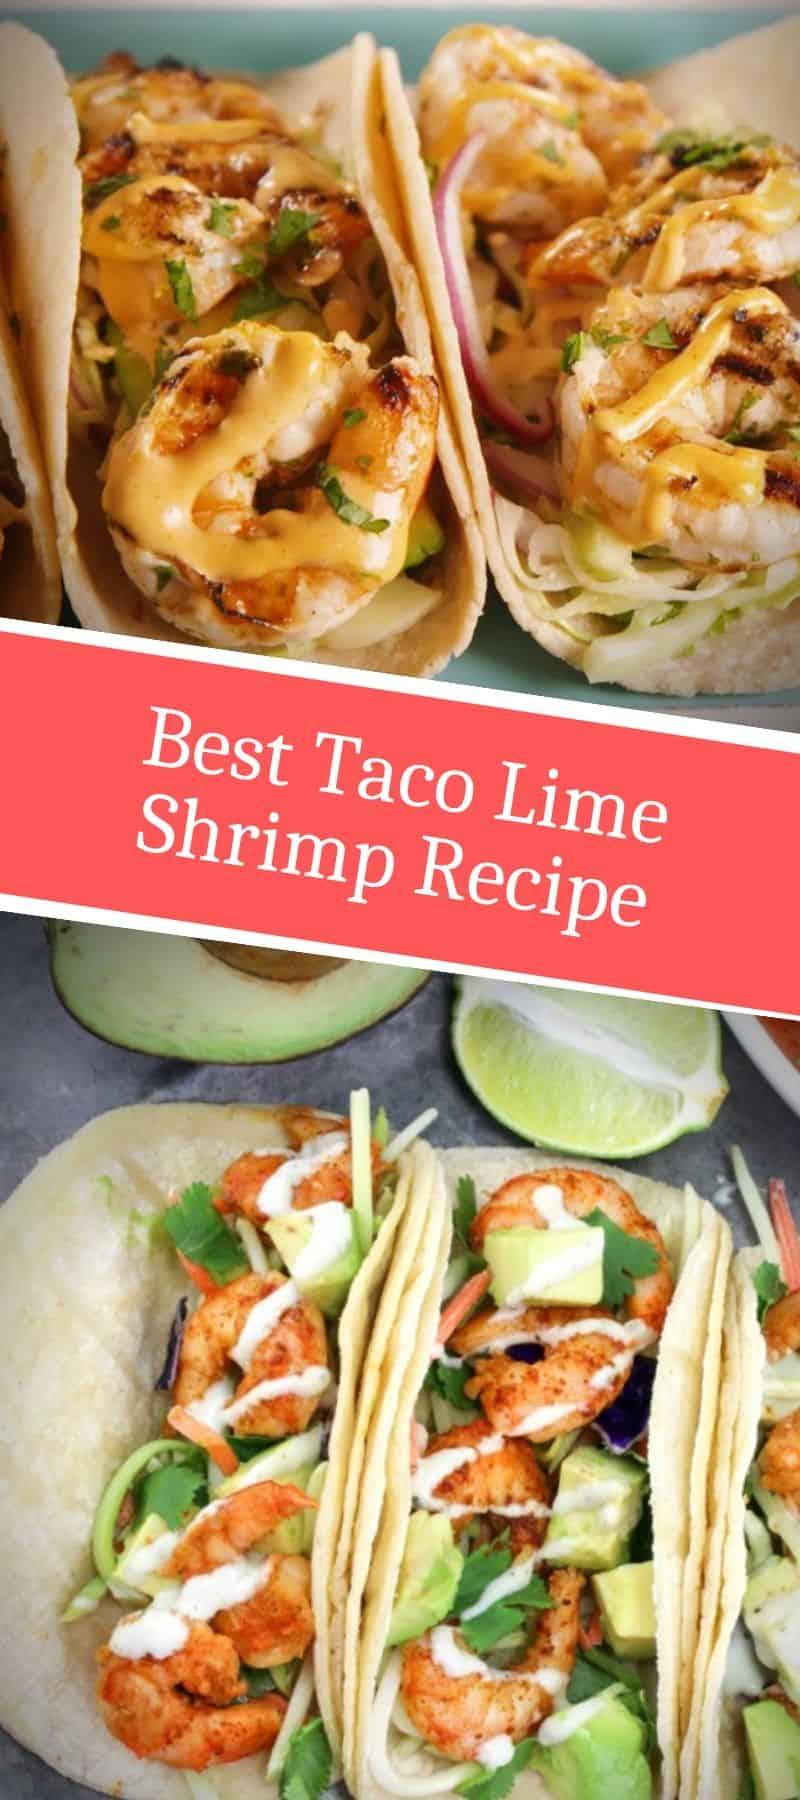 Best Taco Lime Shrimp Recipe 3